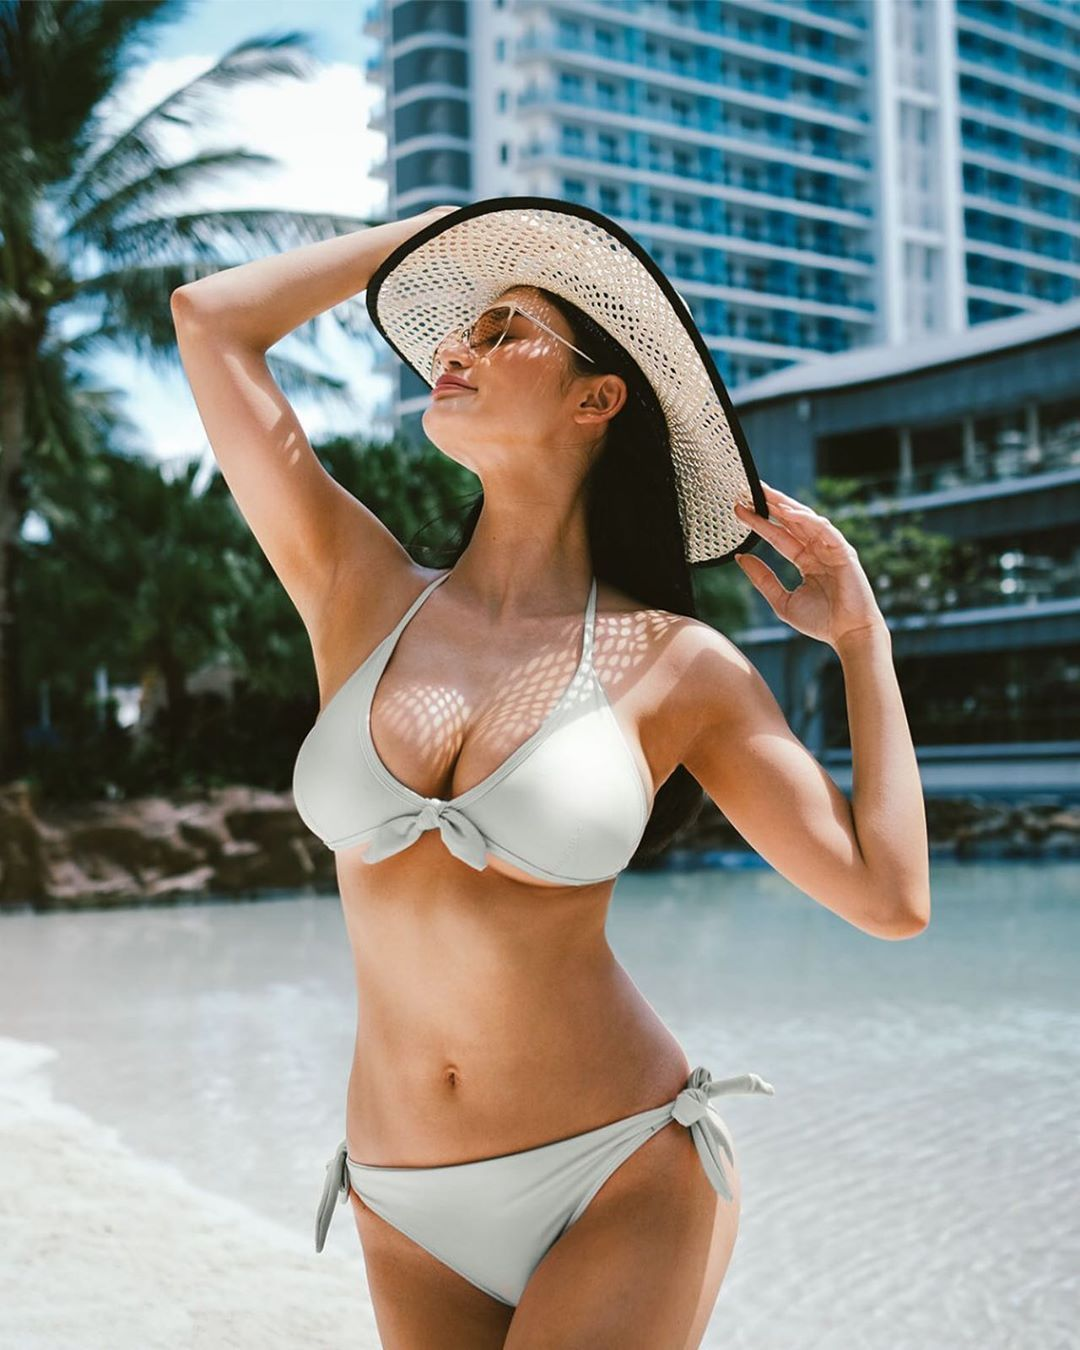 Pia Alonzo Wurtzbach Hot photo 12